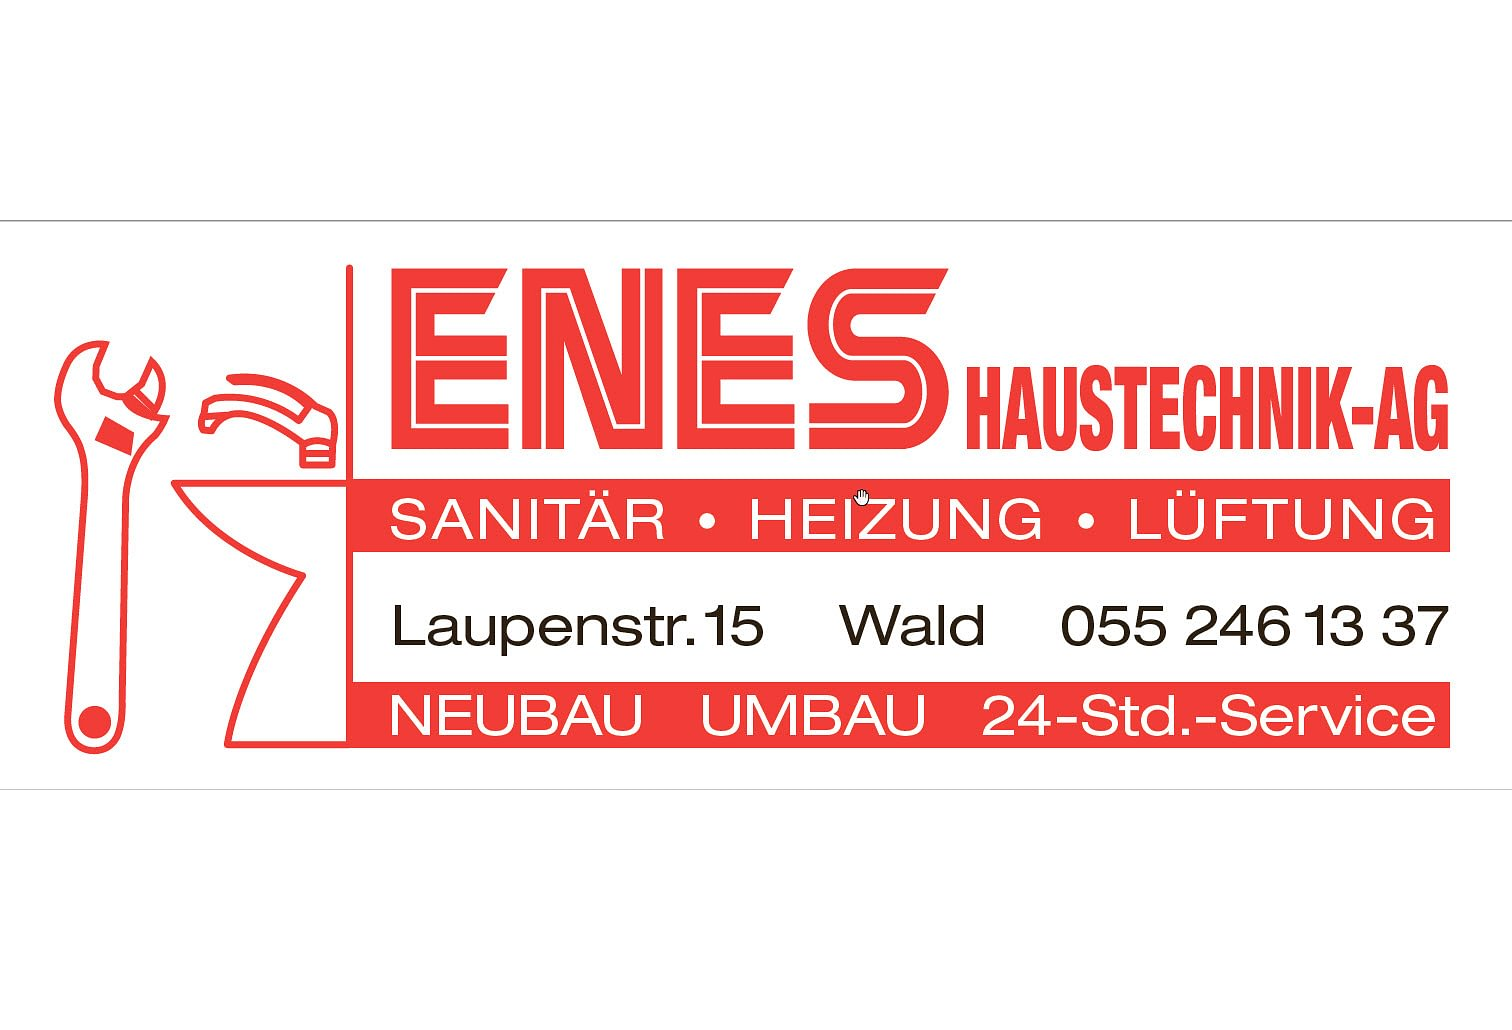 Enes Haustechnik AG